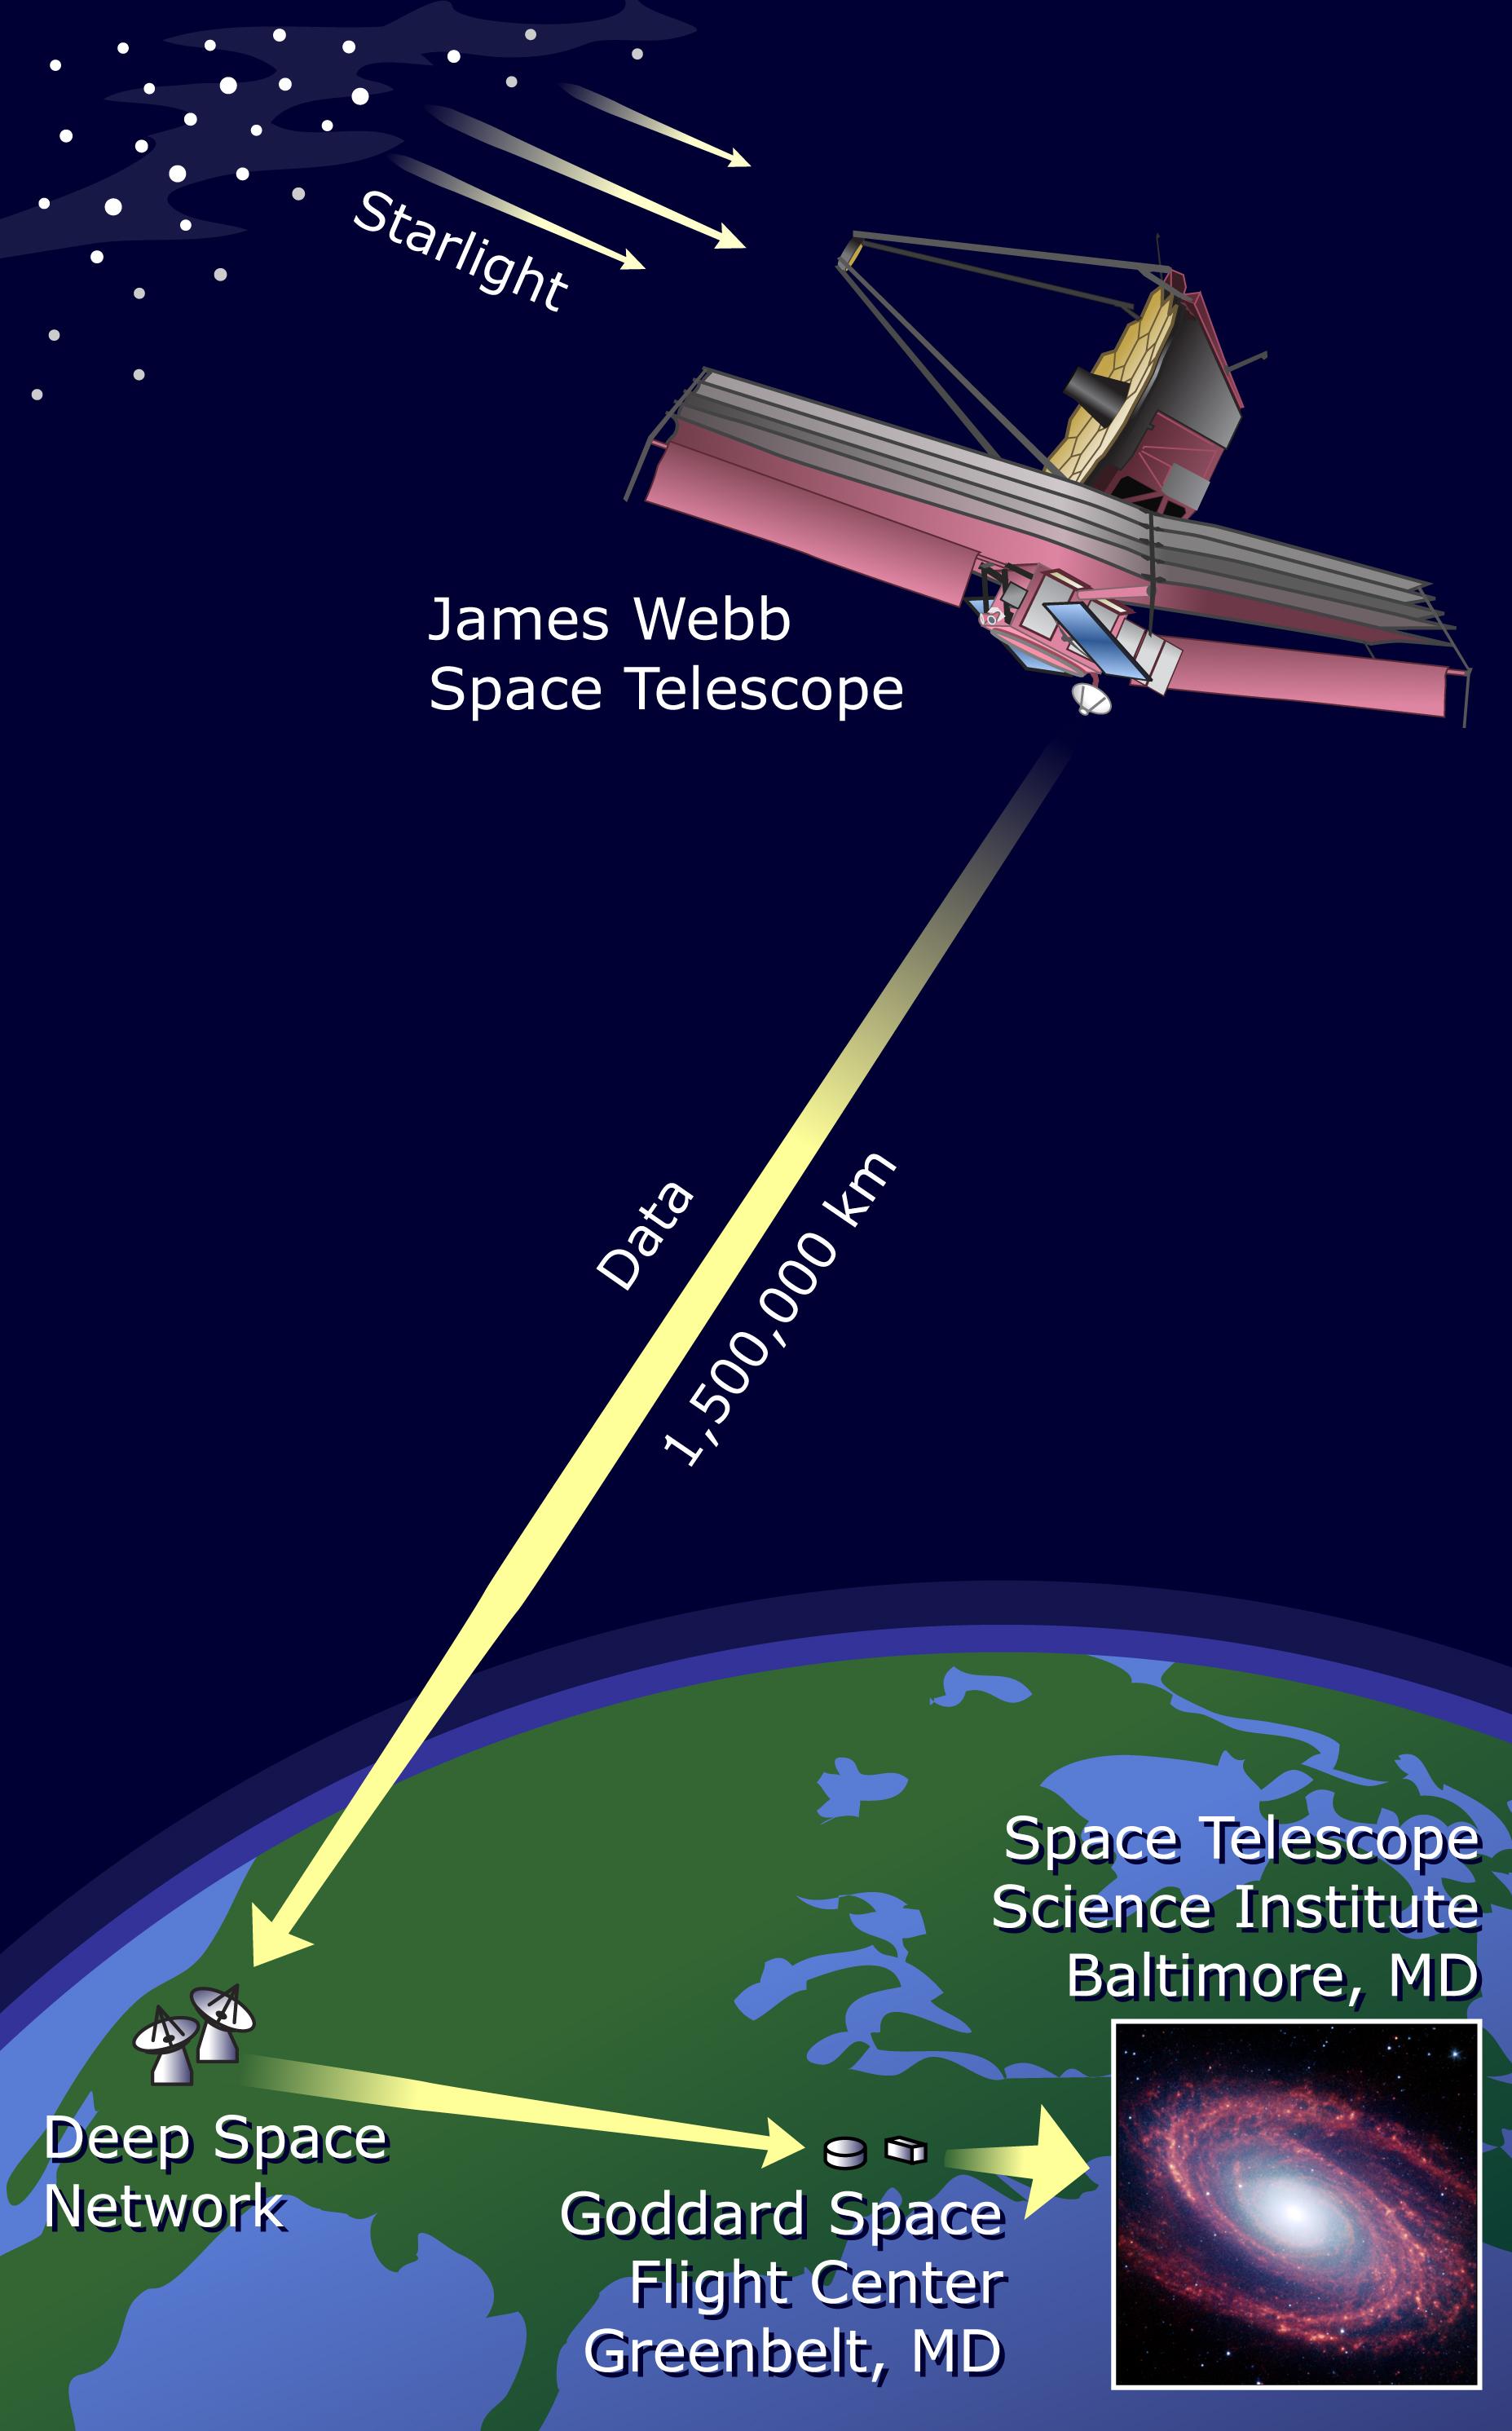 Nasa Customized Telemetry System For The James Webb